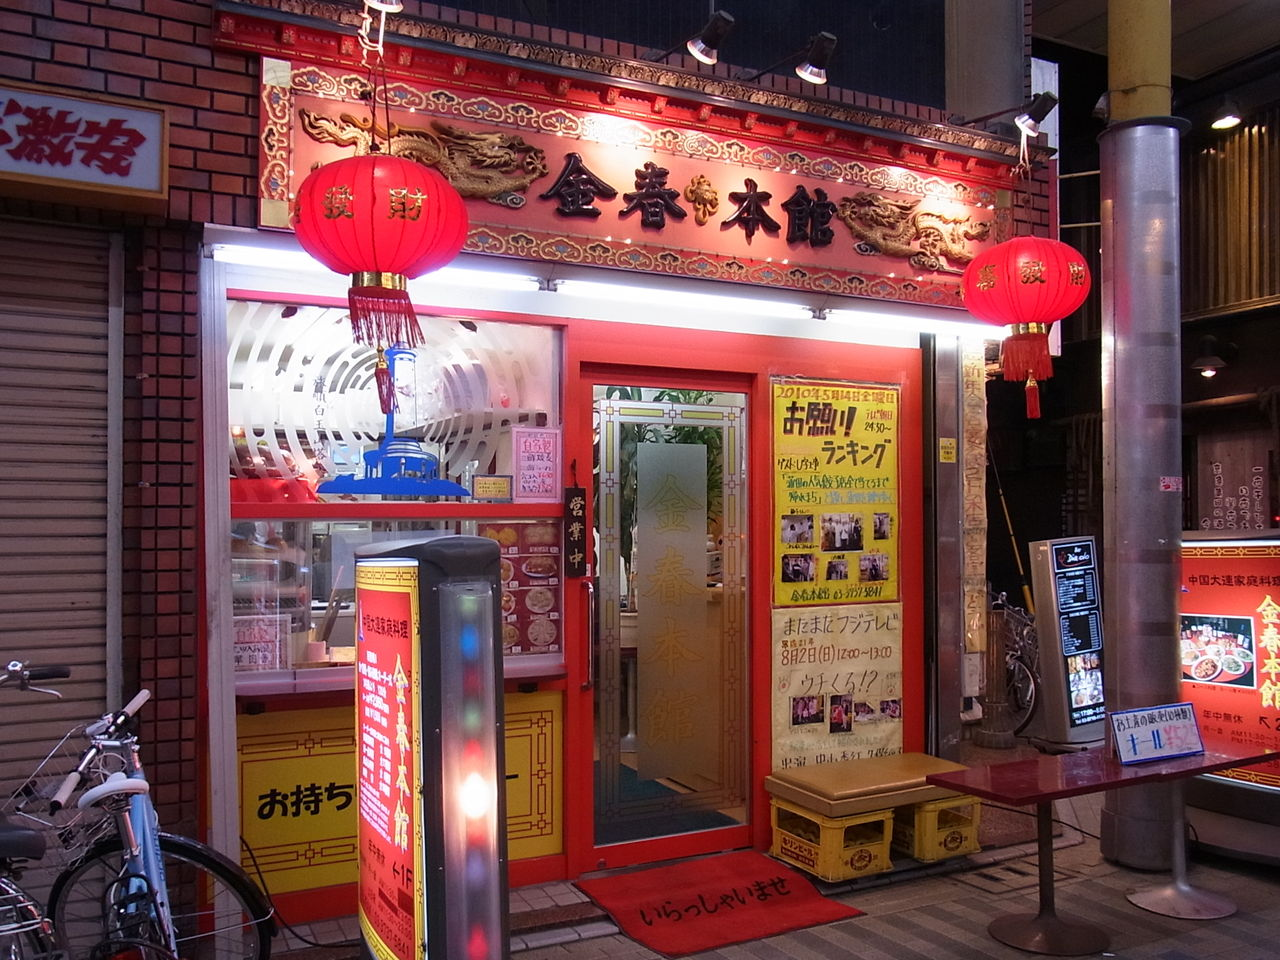 http://livedoor.blogimg.jp/fallindebu/imgs/d/b/dbb6efb1.jpg